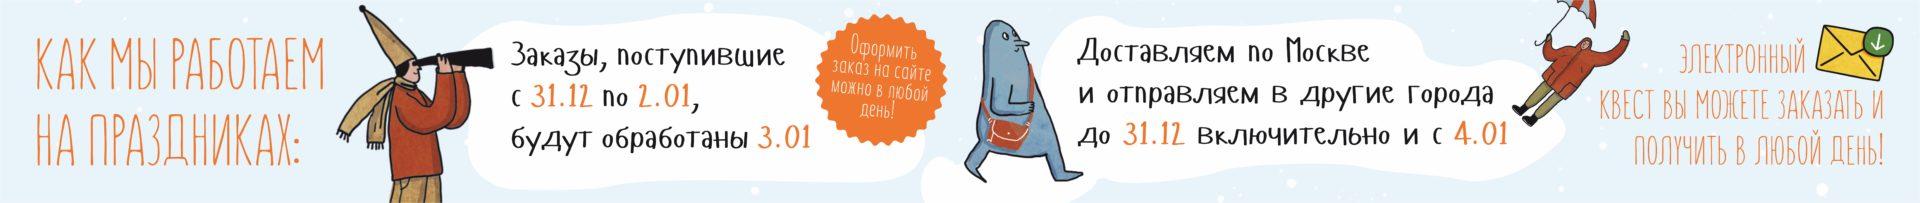 https://www.kotikiteam.ru/wp-content/uploads/2020/12/Баннер_раборта-в-праздники_web-scaled.jpg